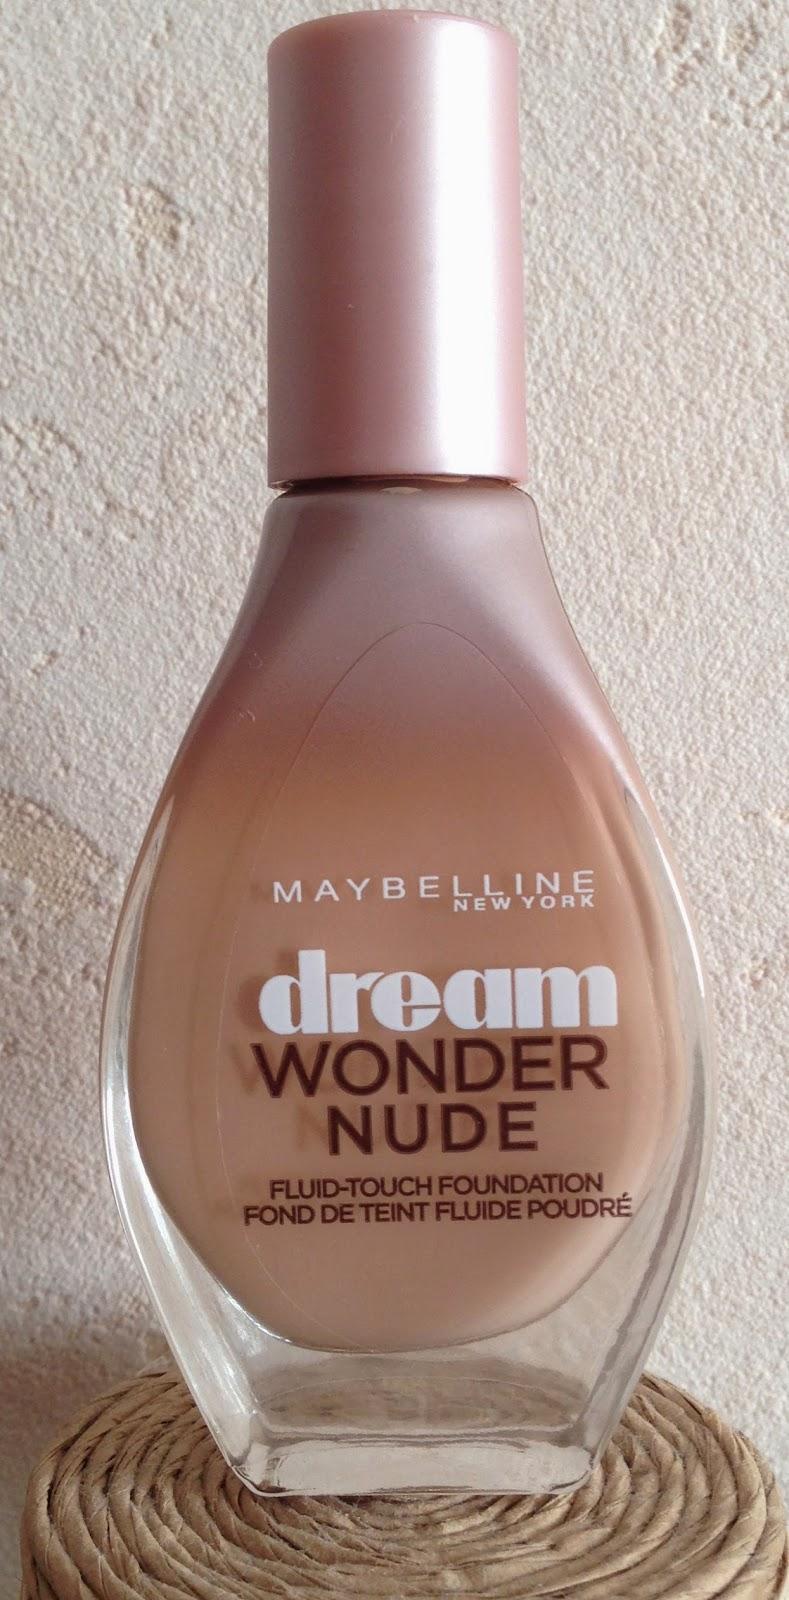 Flacon du fond de teint drean wonder nude de chez Maybelline